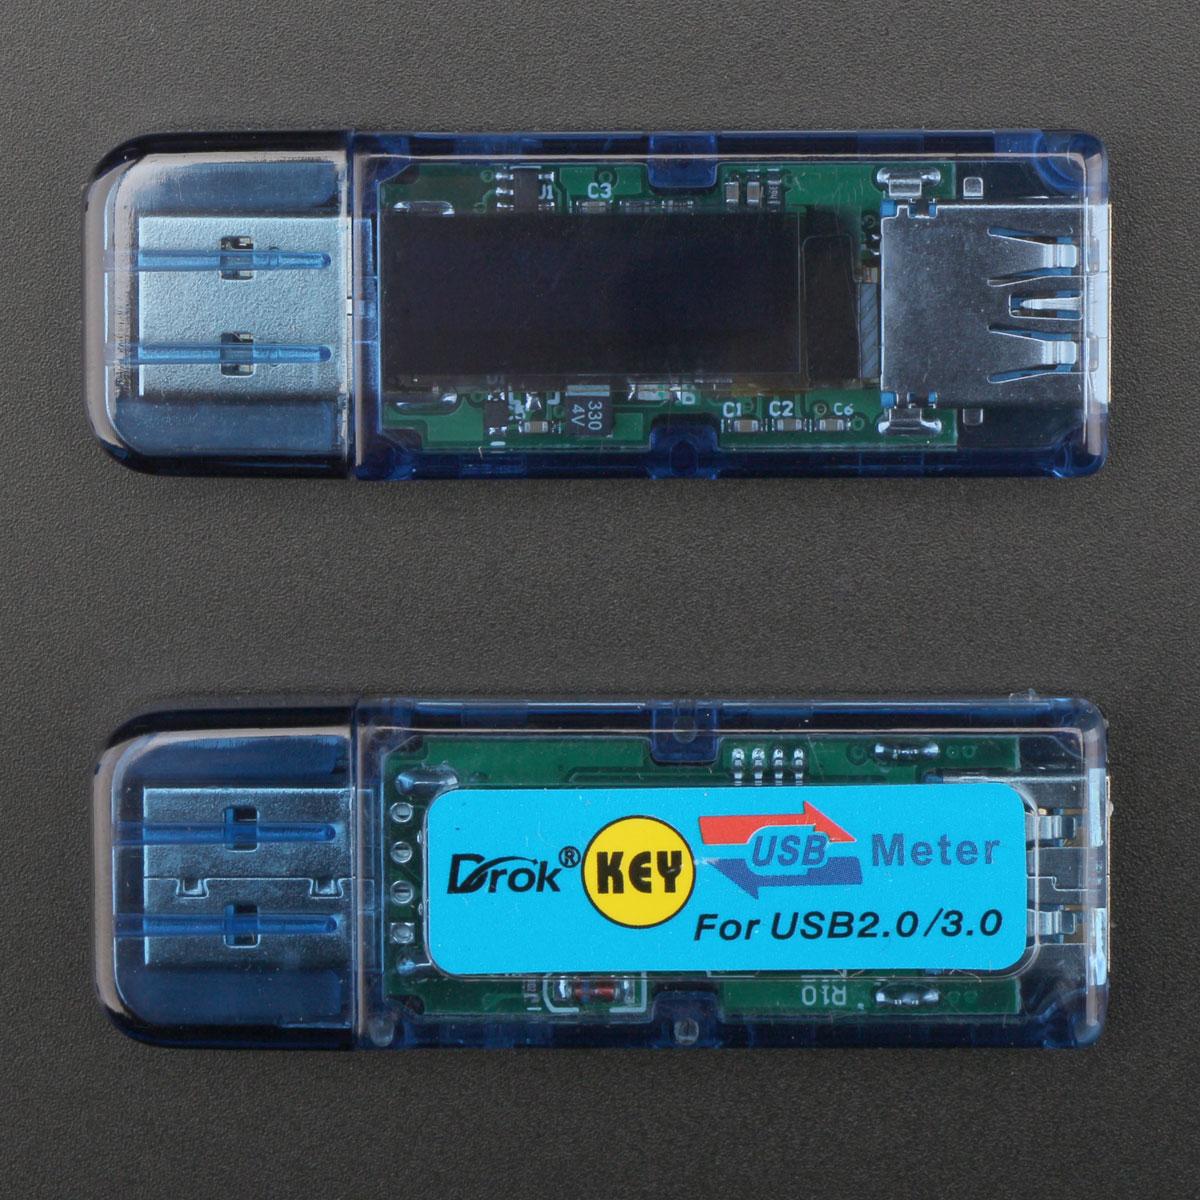 Micro OLED USB 3.0 Meter